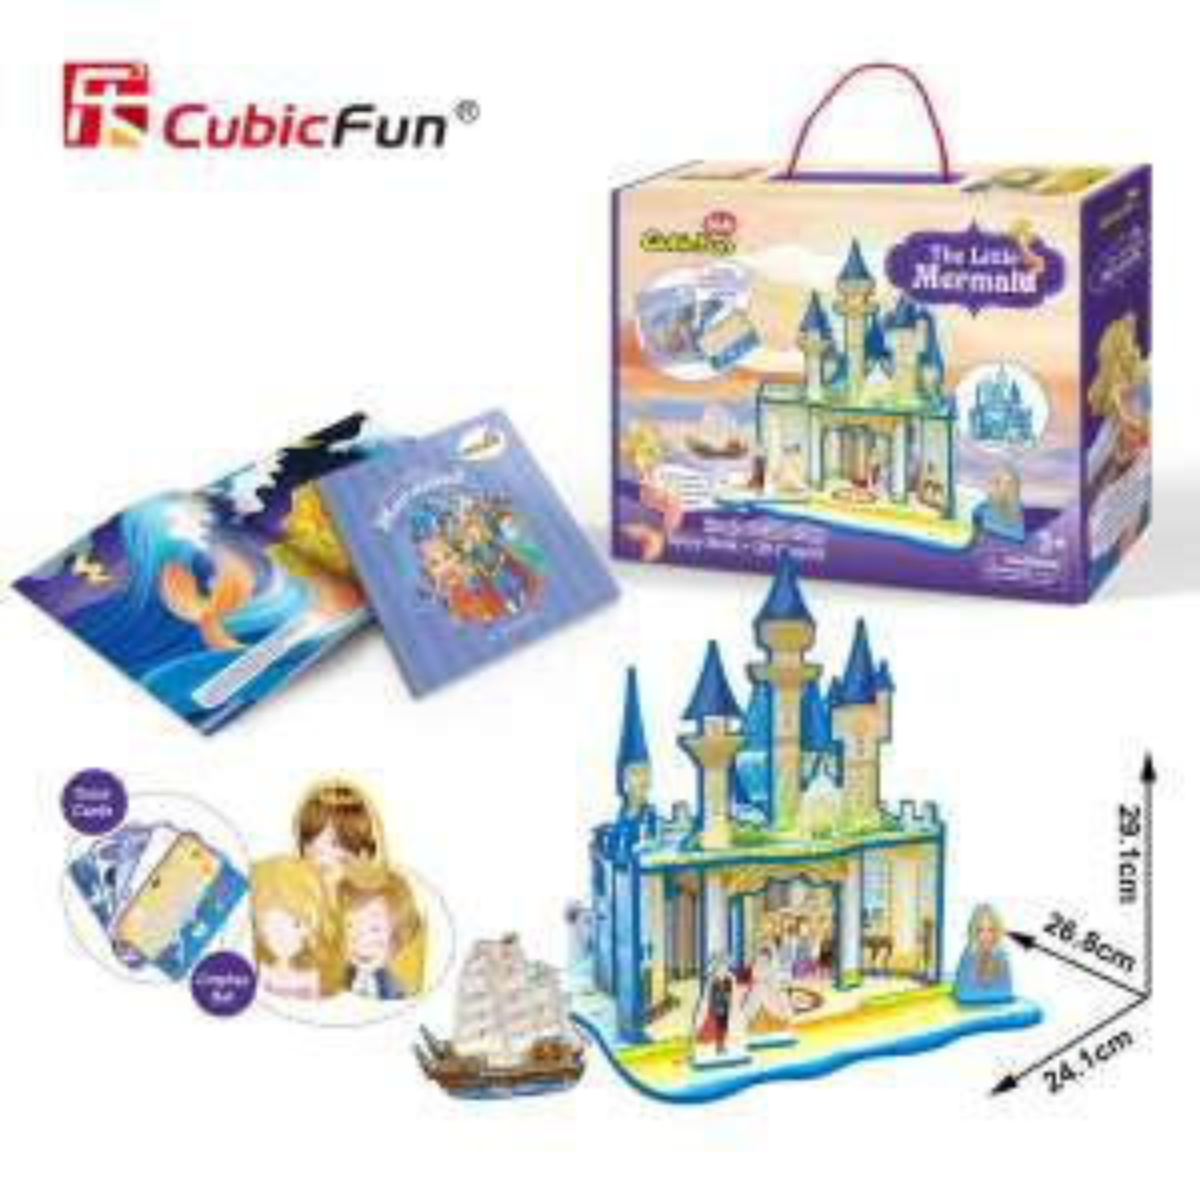 Puzzle 3D Cubic Fun Mała Syrenka EMPIK Prezent na Dzień Dziecka